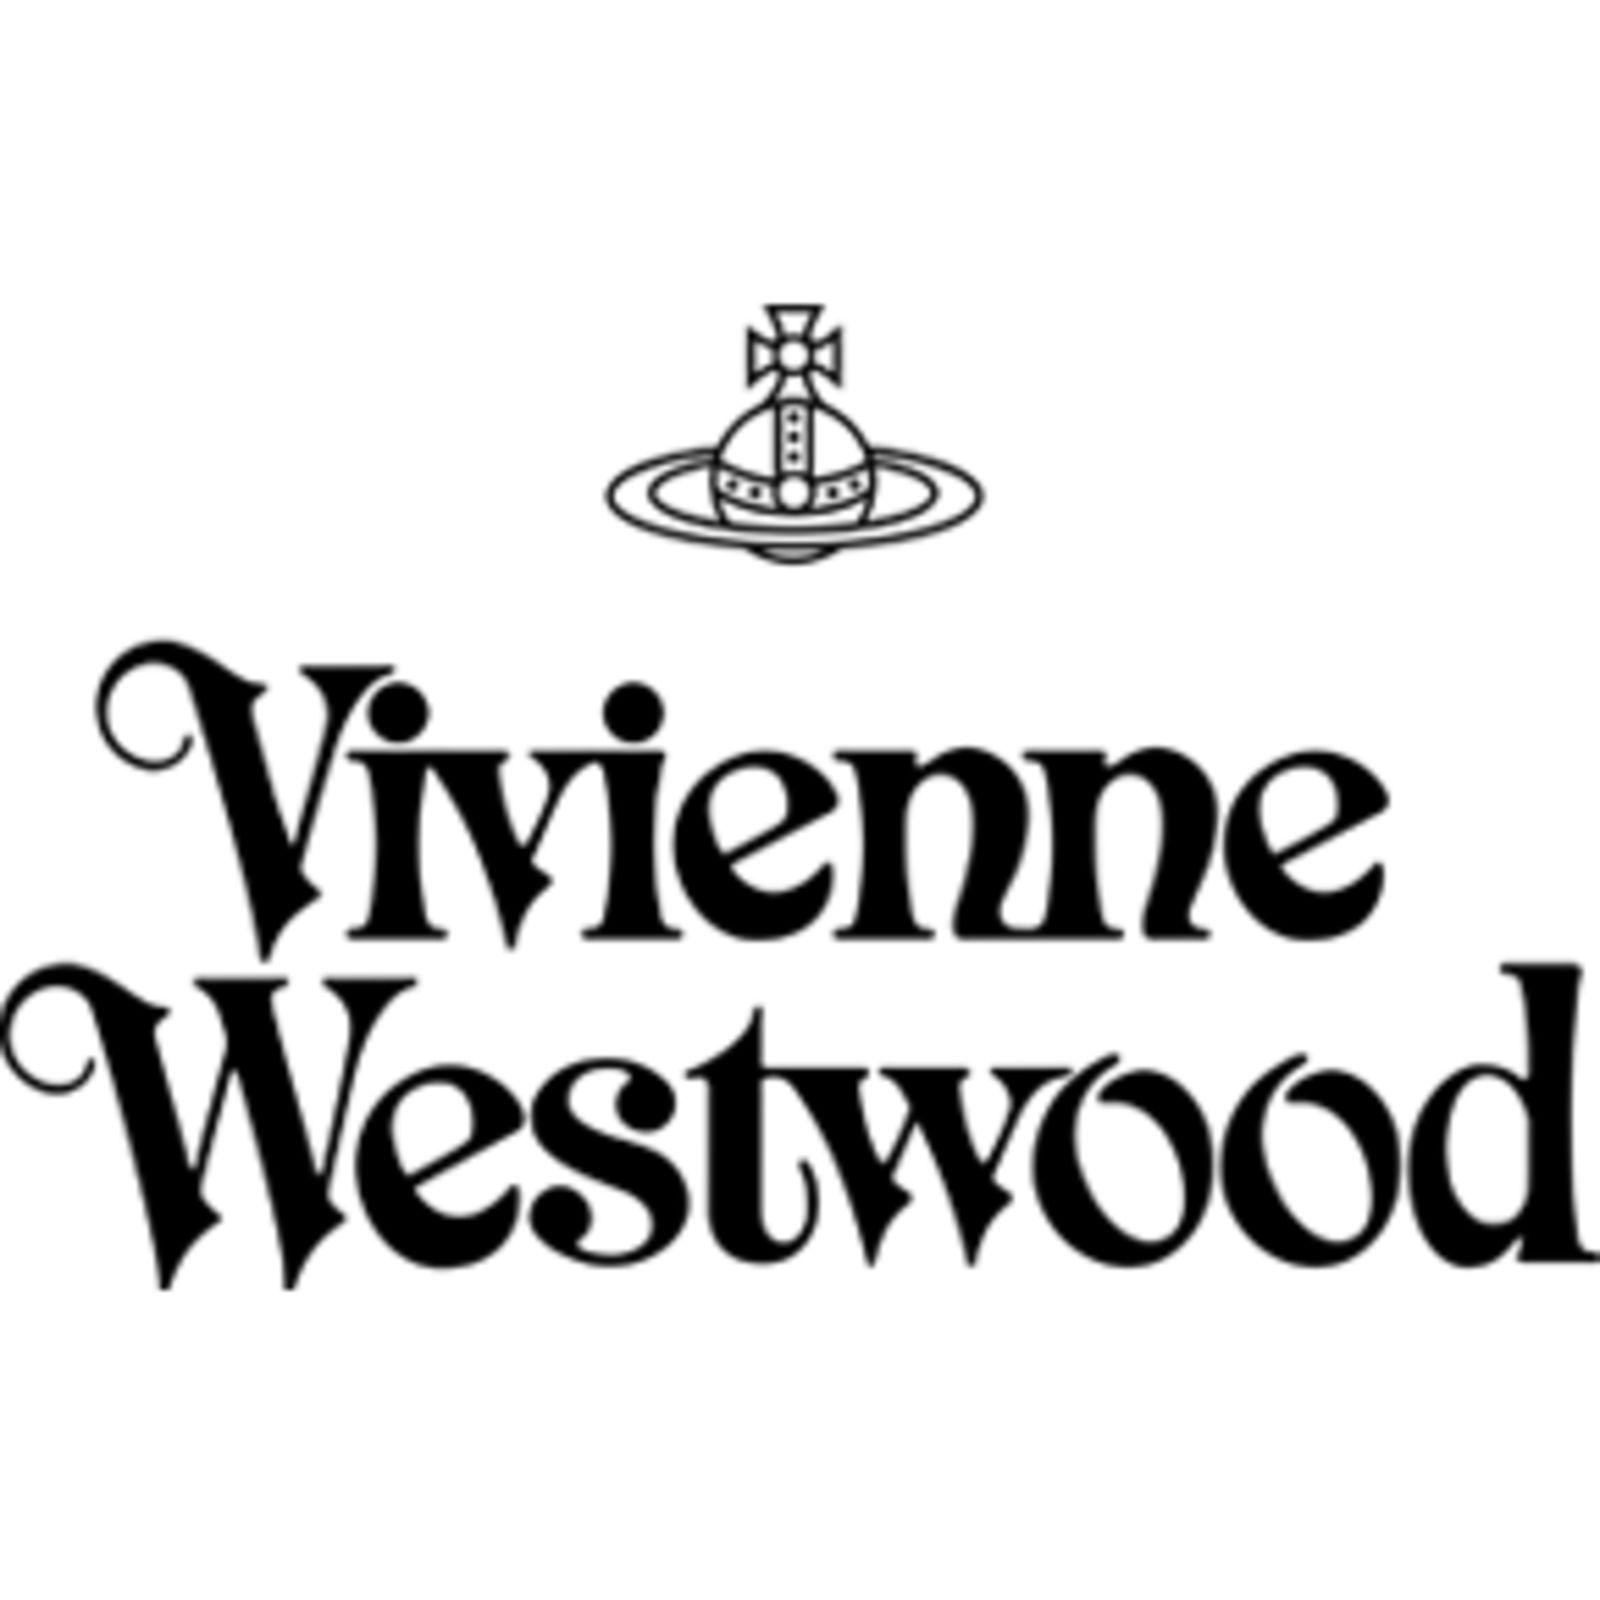 VIVIENNE WESTWOOD (Изображение 1)